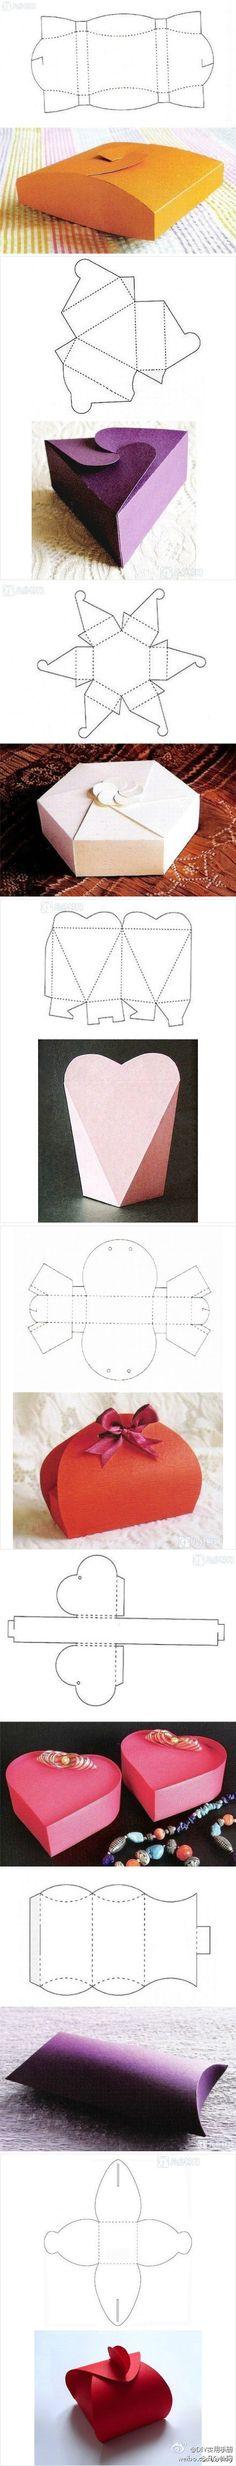 cool box ideas, fold and cut